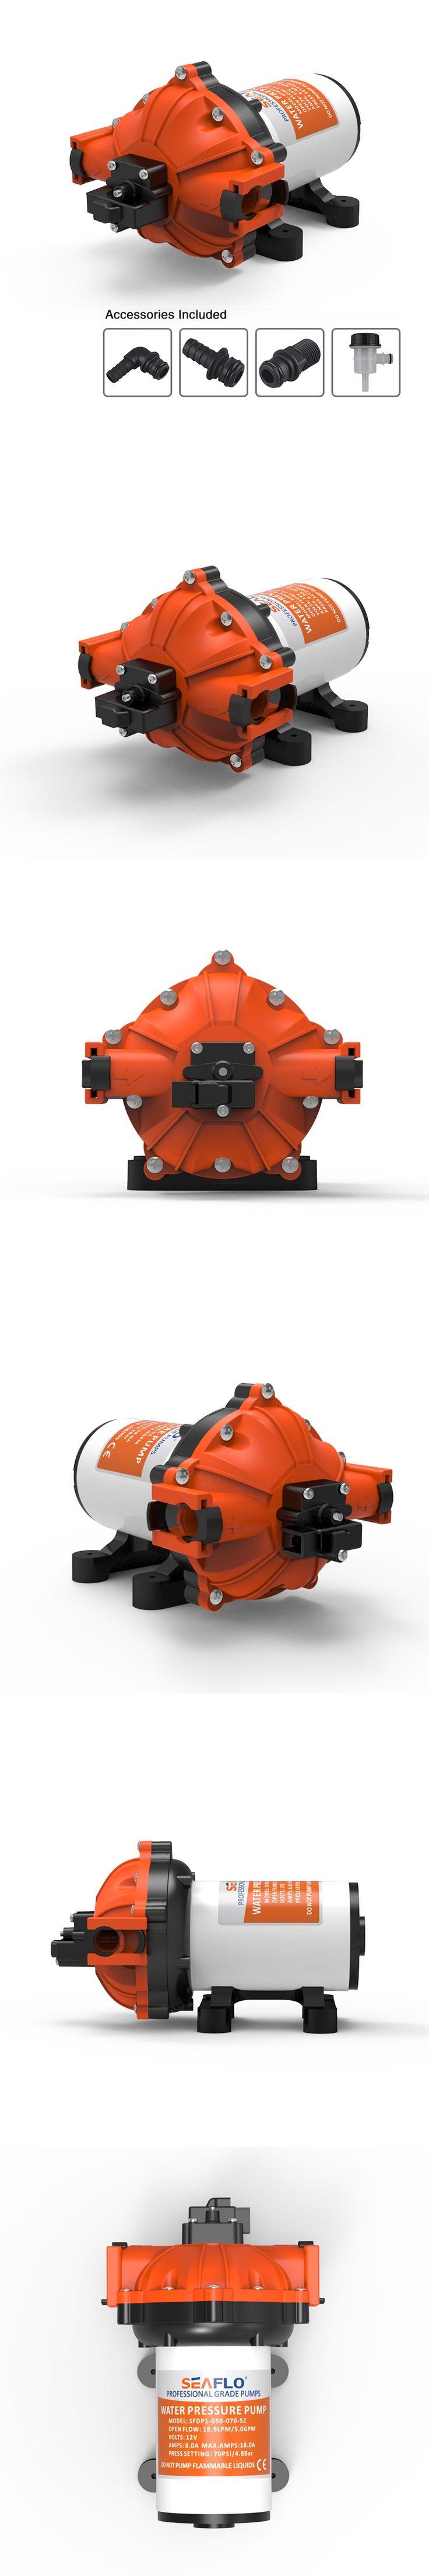 SEAFLO Water Pressure Pump 70PSI 18.9 LPM 12v Pump Caravan Positive Displacement Water Pumps in Agriculture